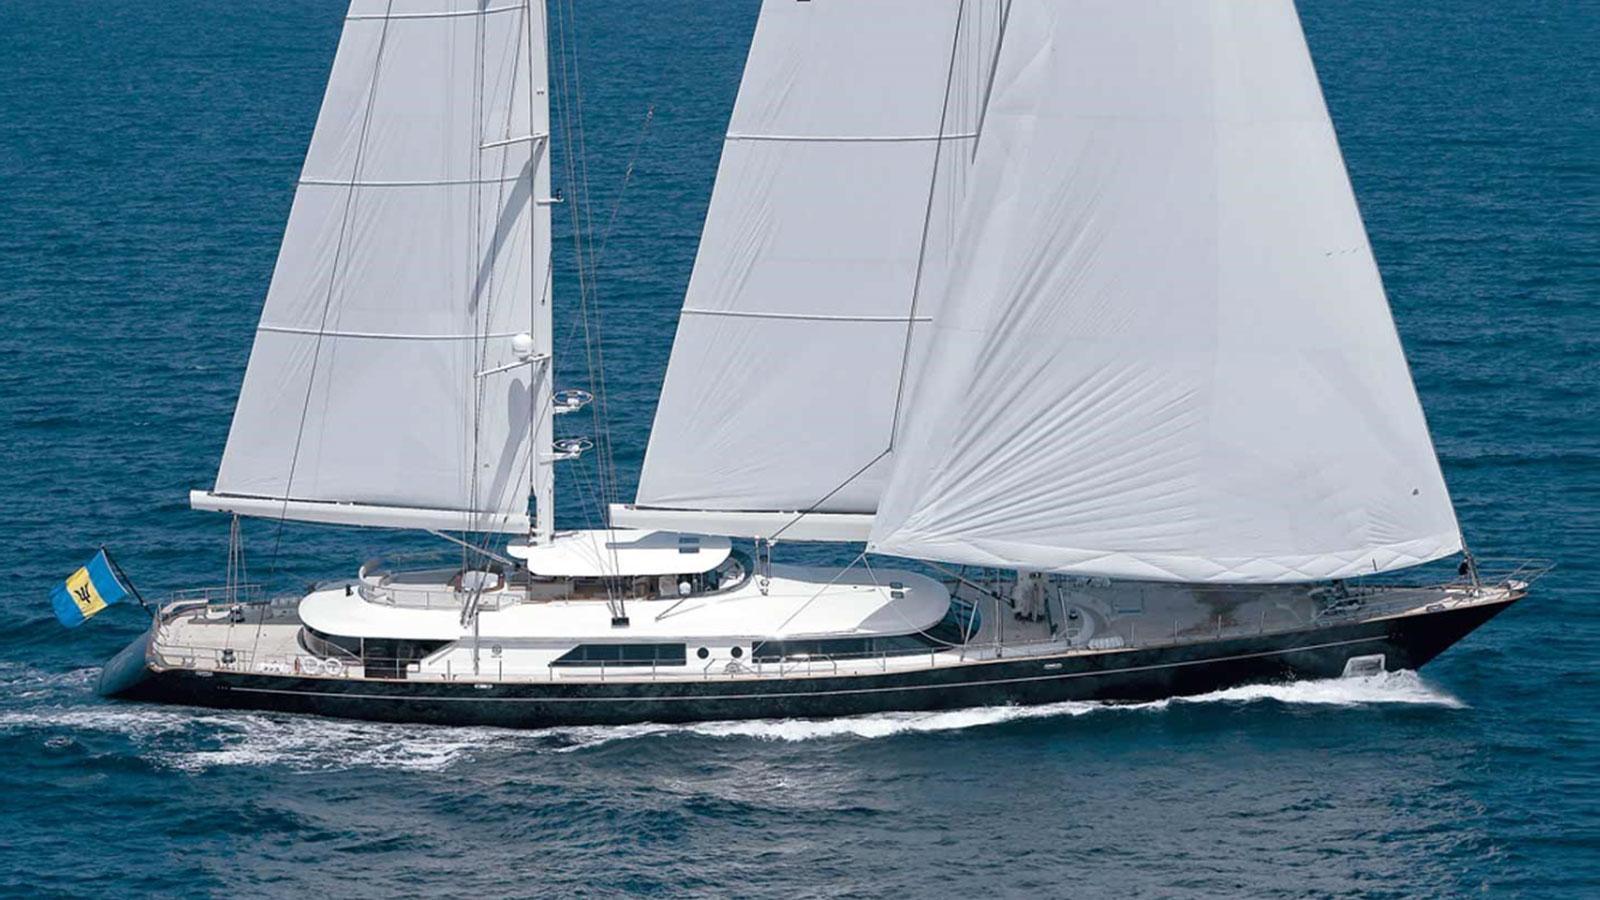 selene-super-yacht-sailing-boat